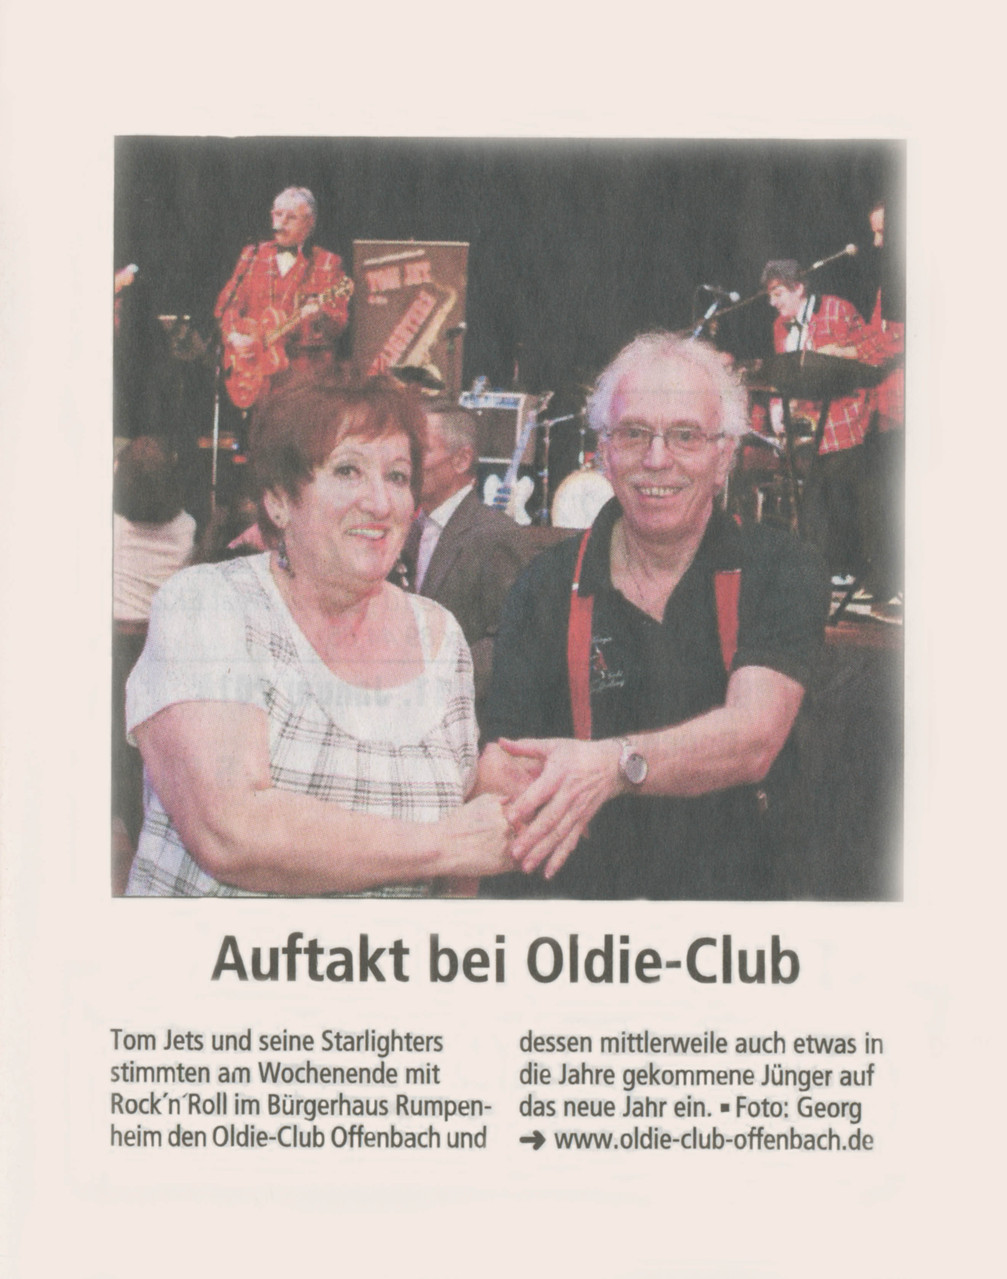 Offenbach Post, 8. Januar 2014